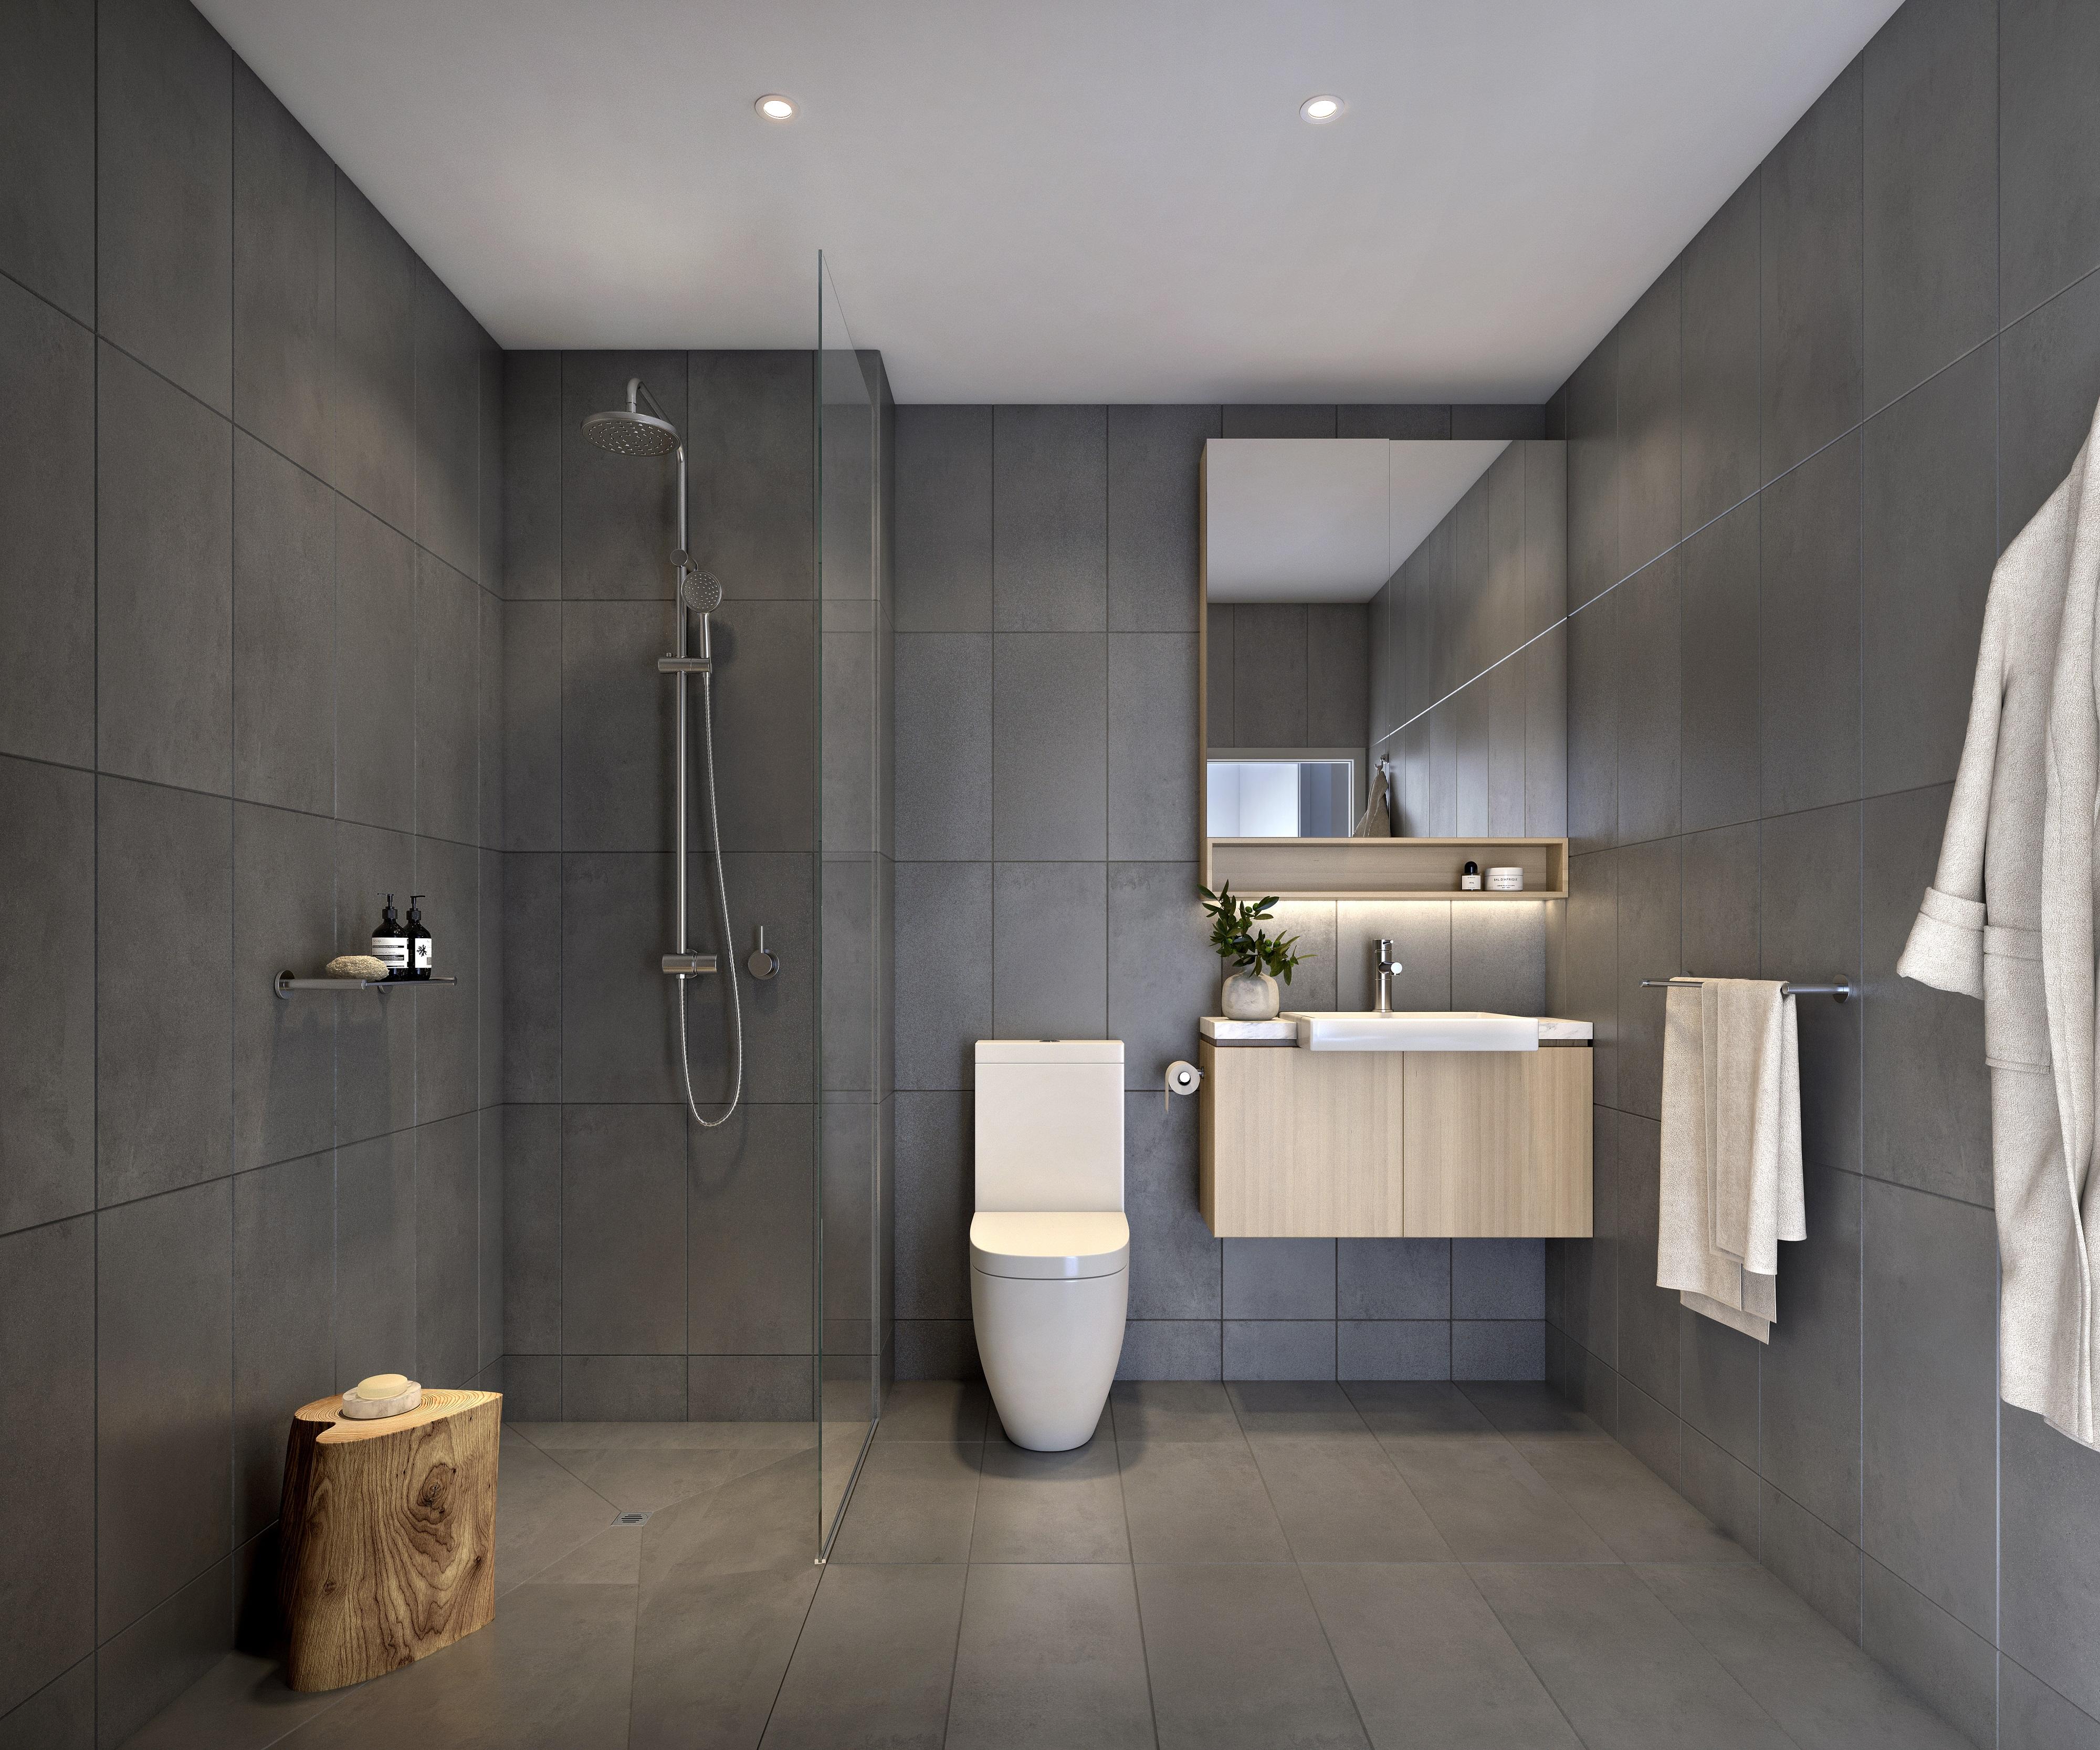 INT03_Francom St_Bathroom_DARK